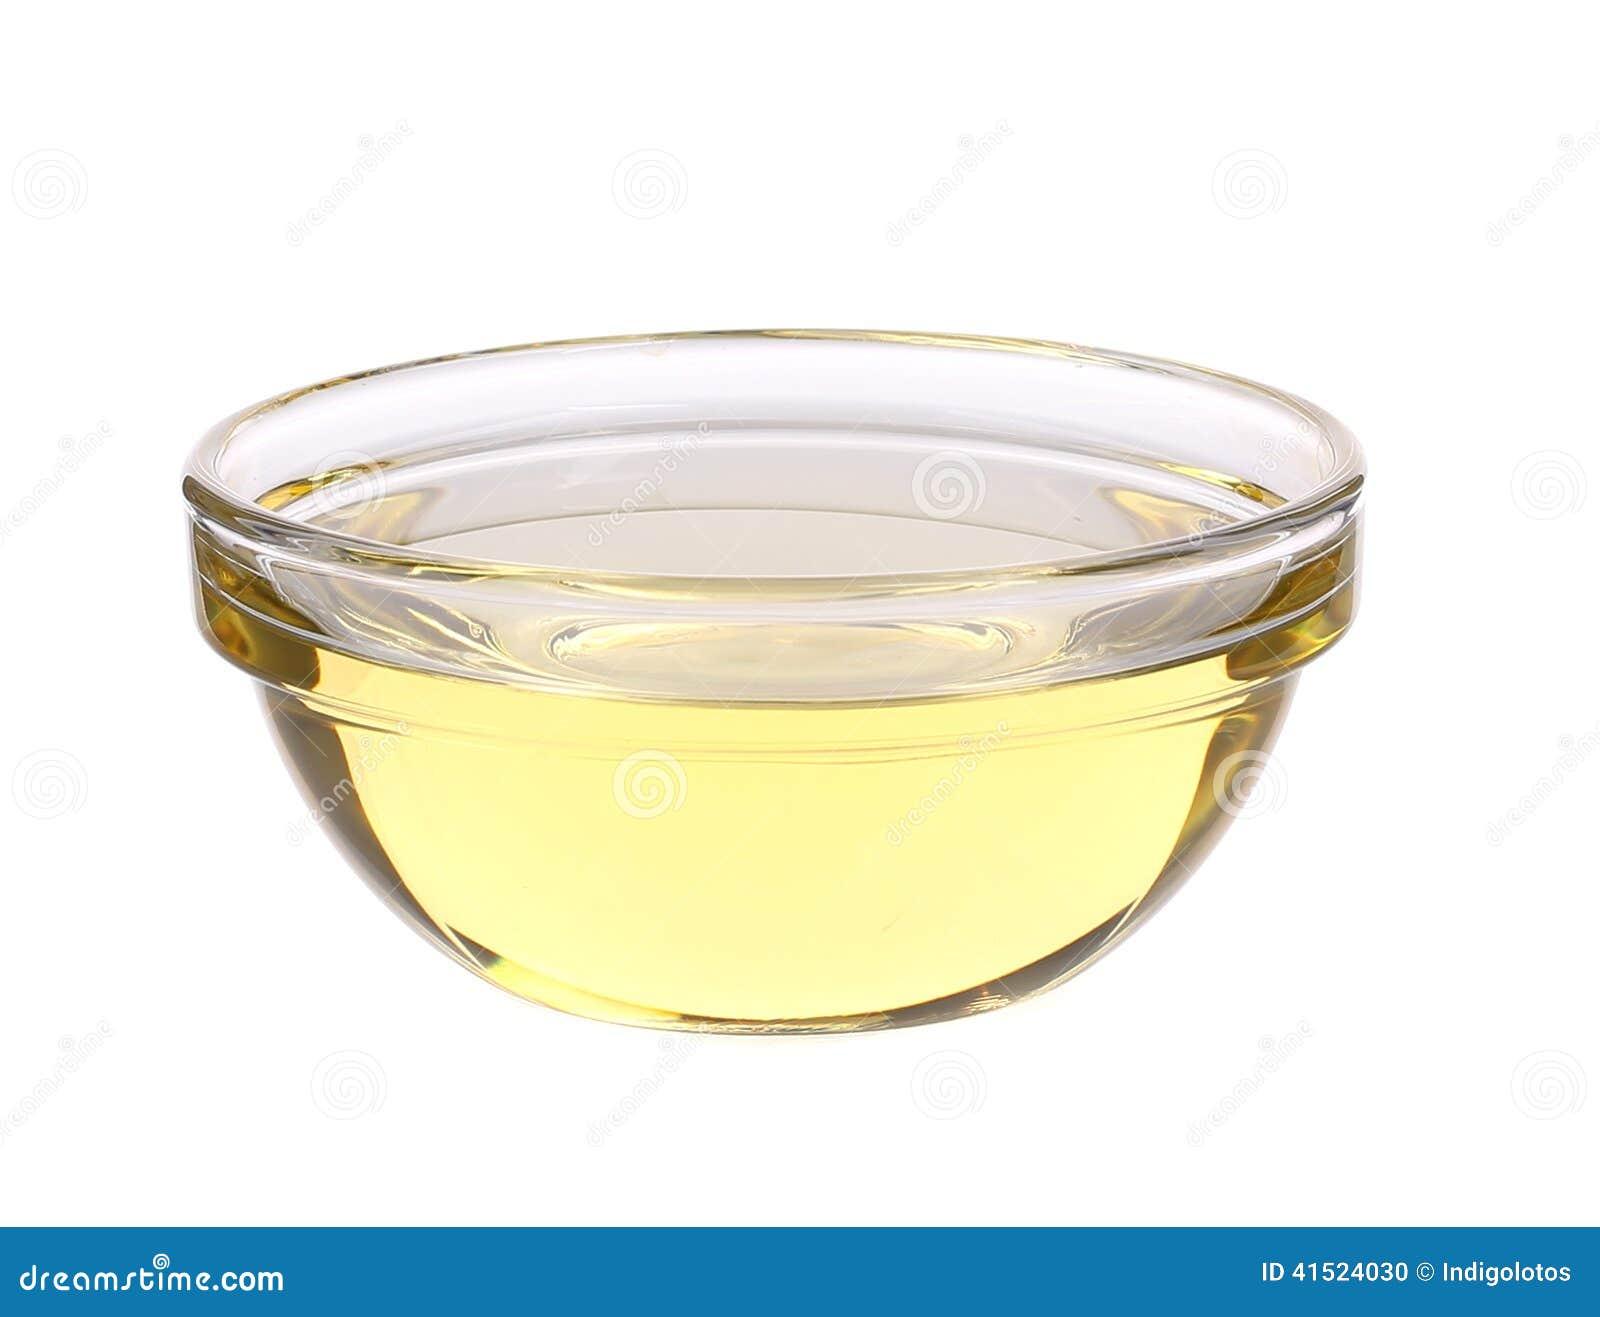 Aceite de girasol en bol de vidrio foto de archivo - Bol de vidrio ...